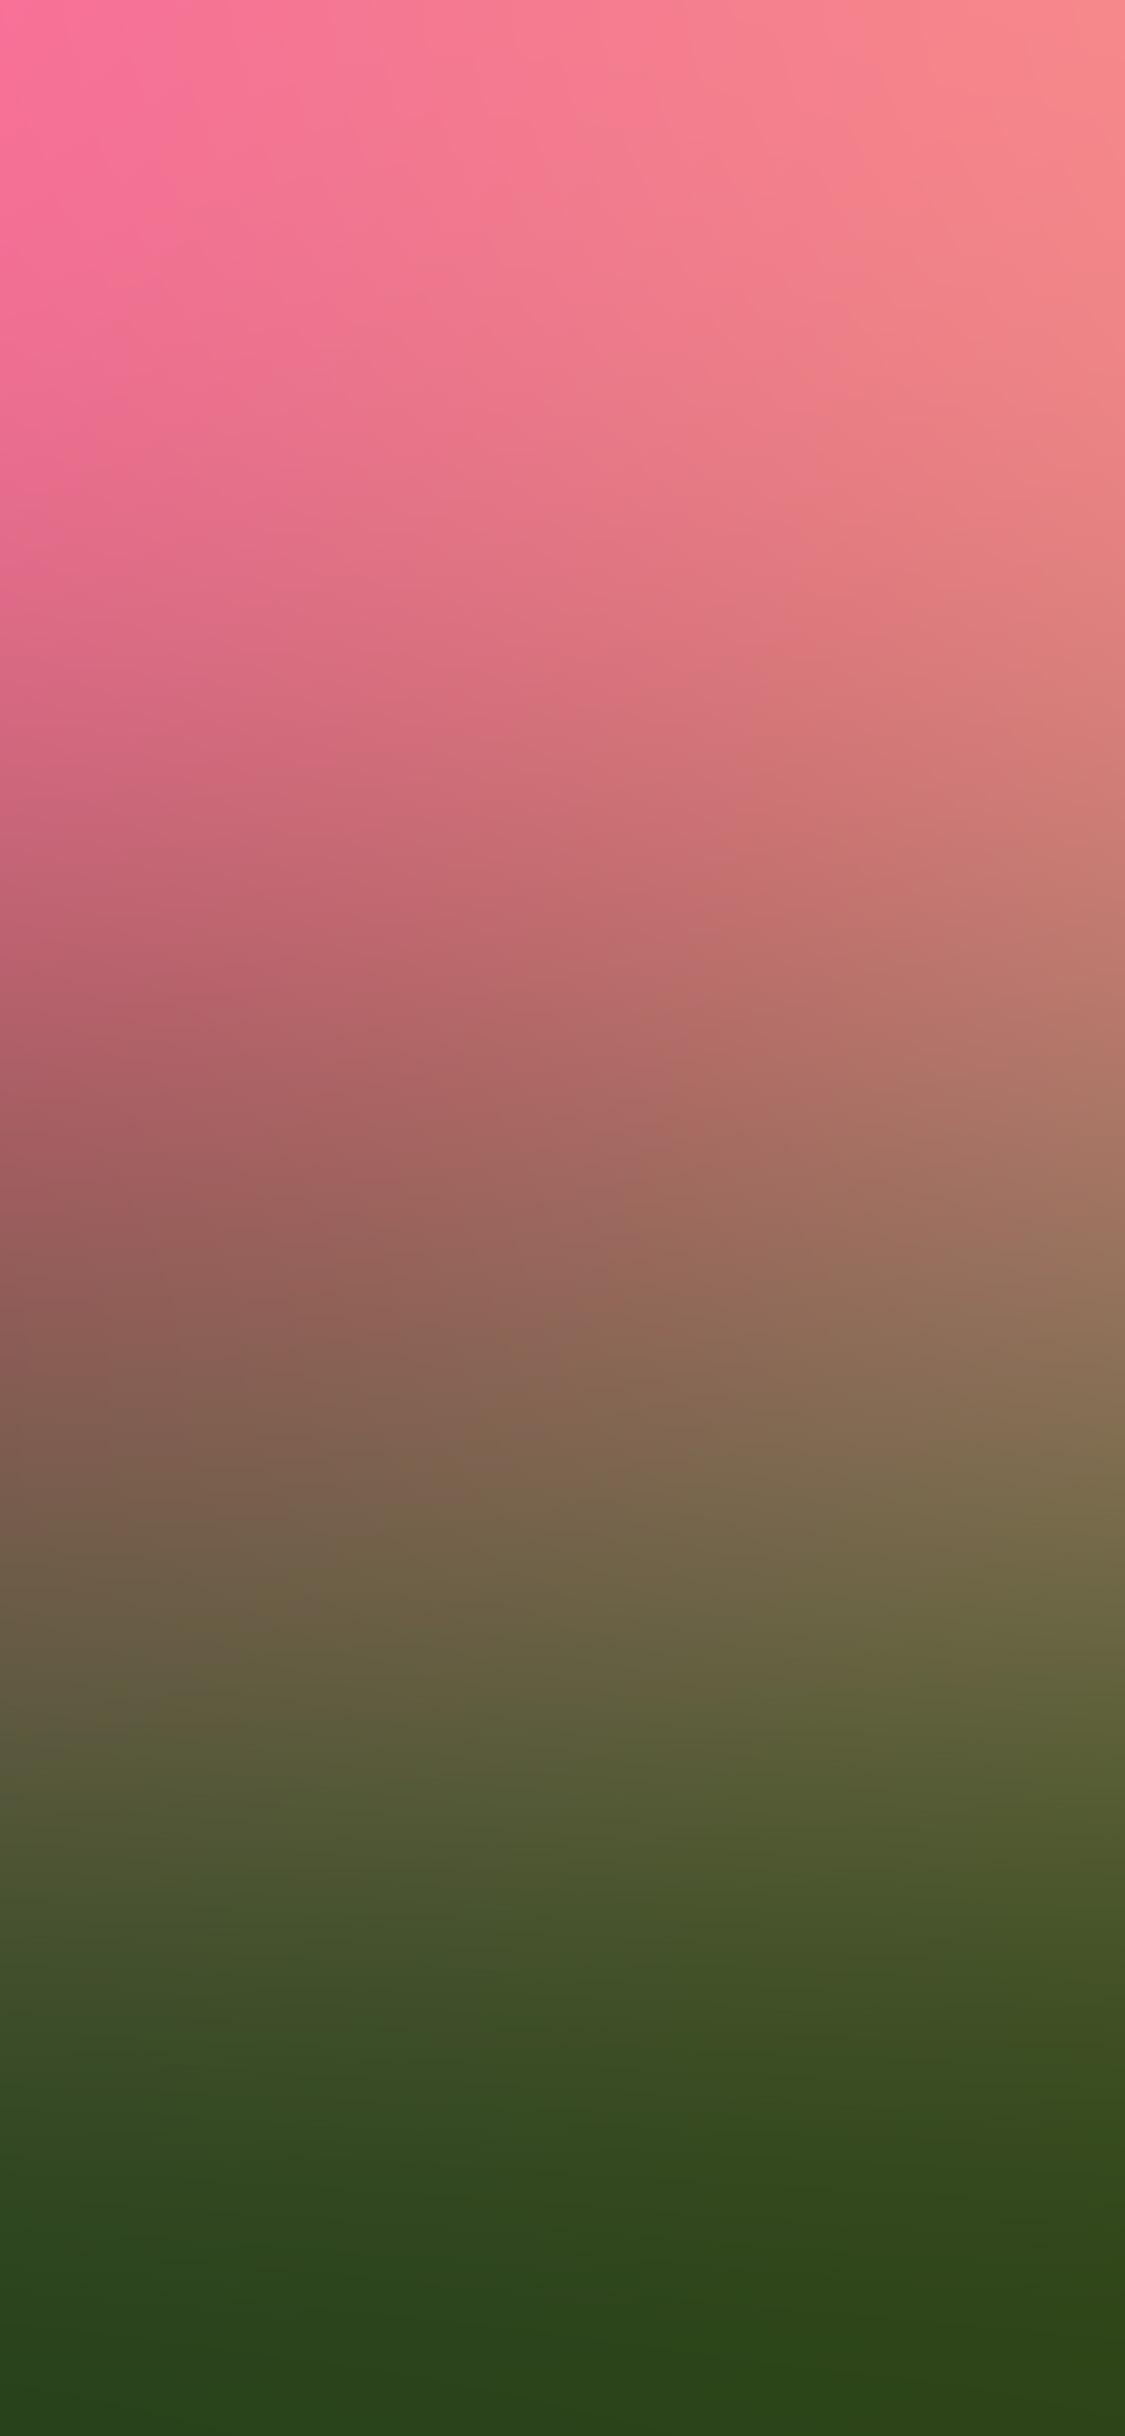 iPhonexpapers.com-Apple-iPhone-wallpaper-so37-blur-gradation-pink-purple